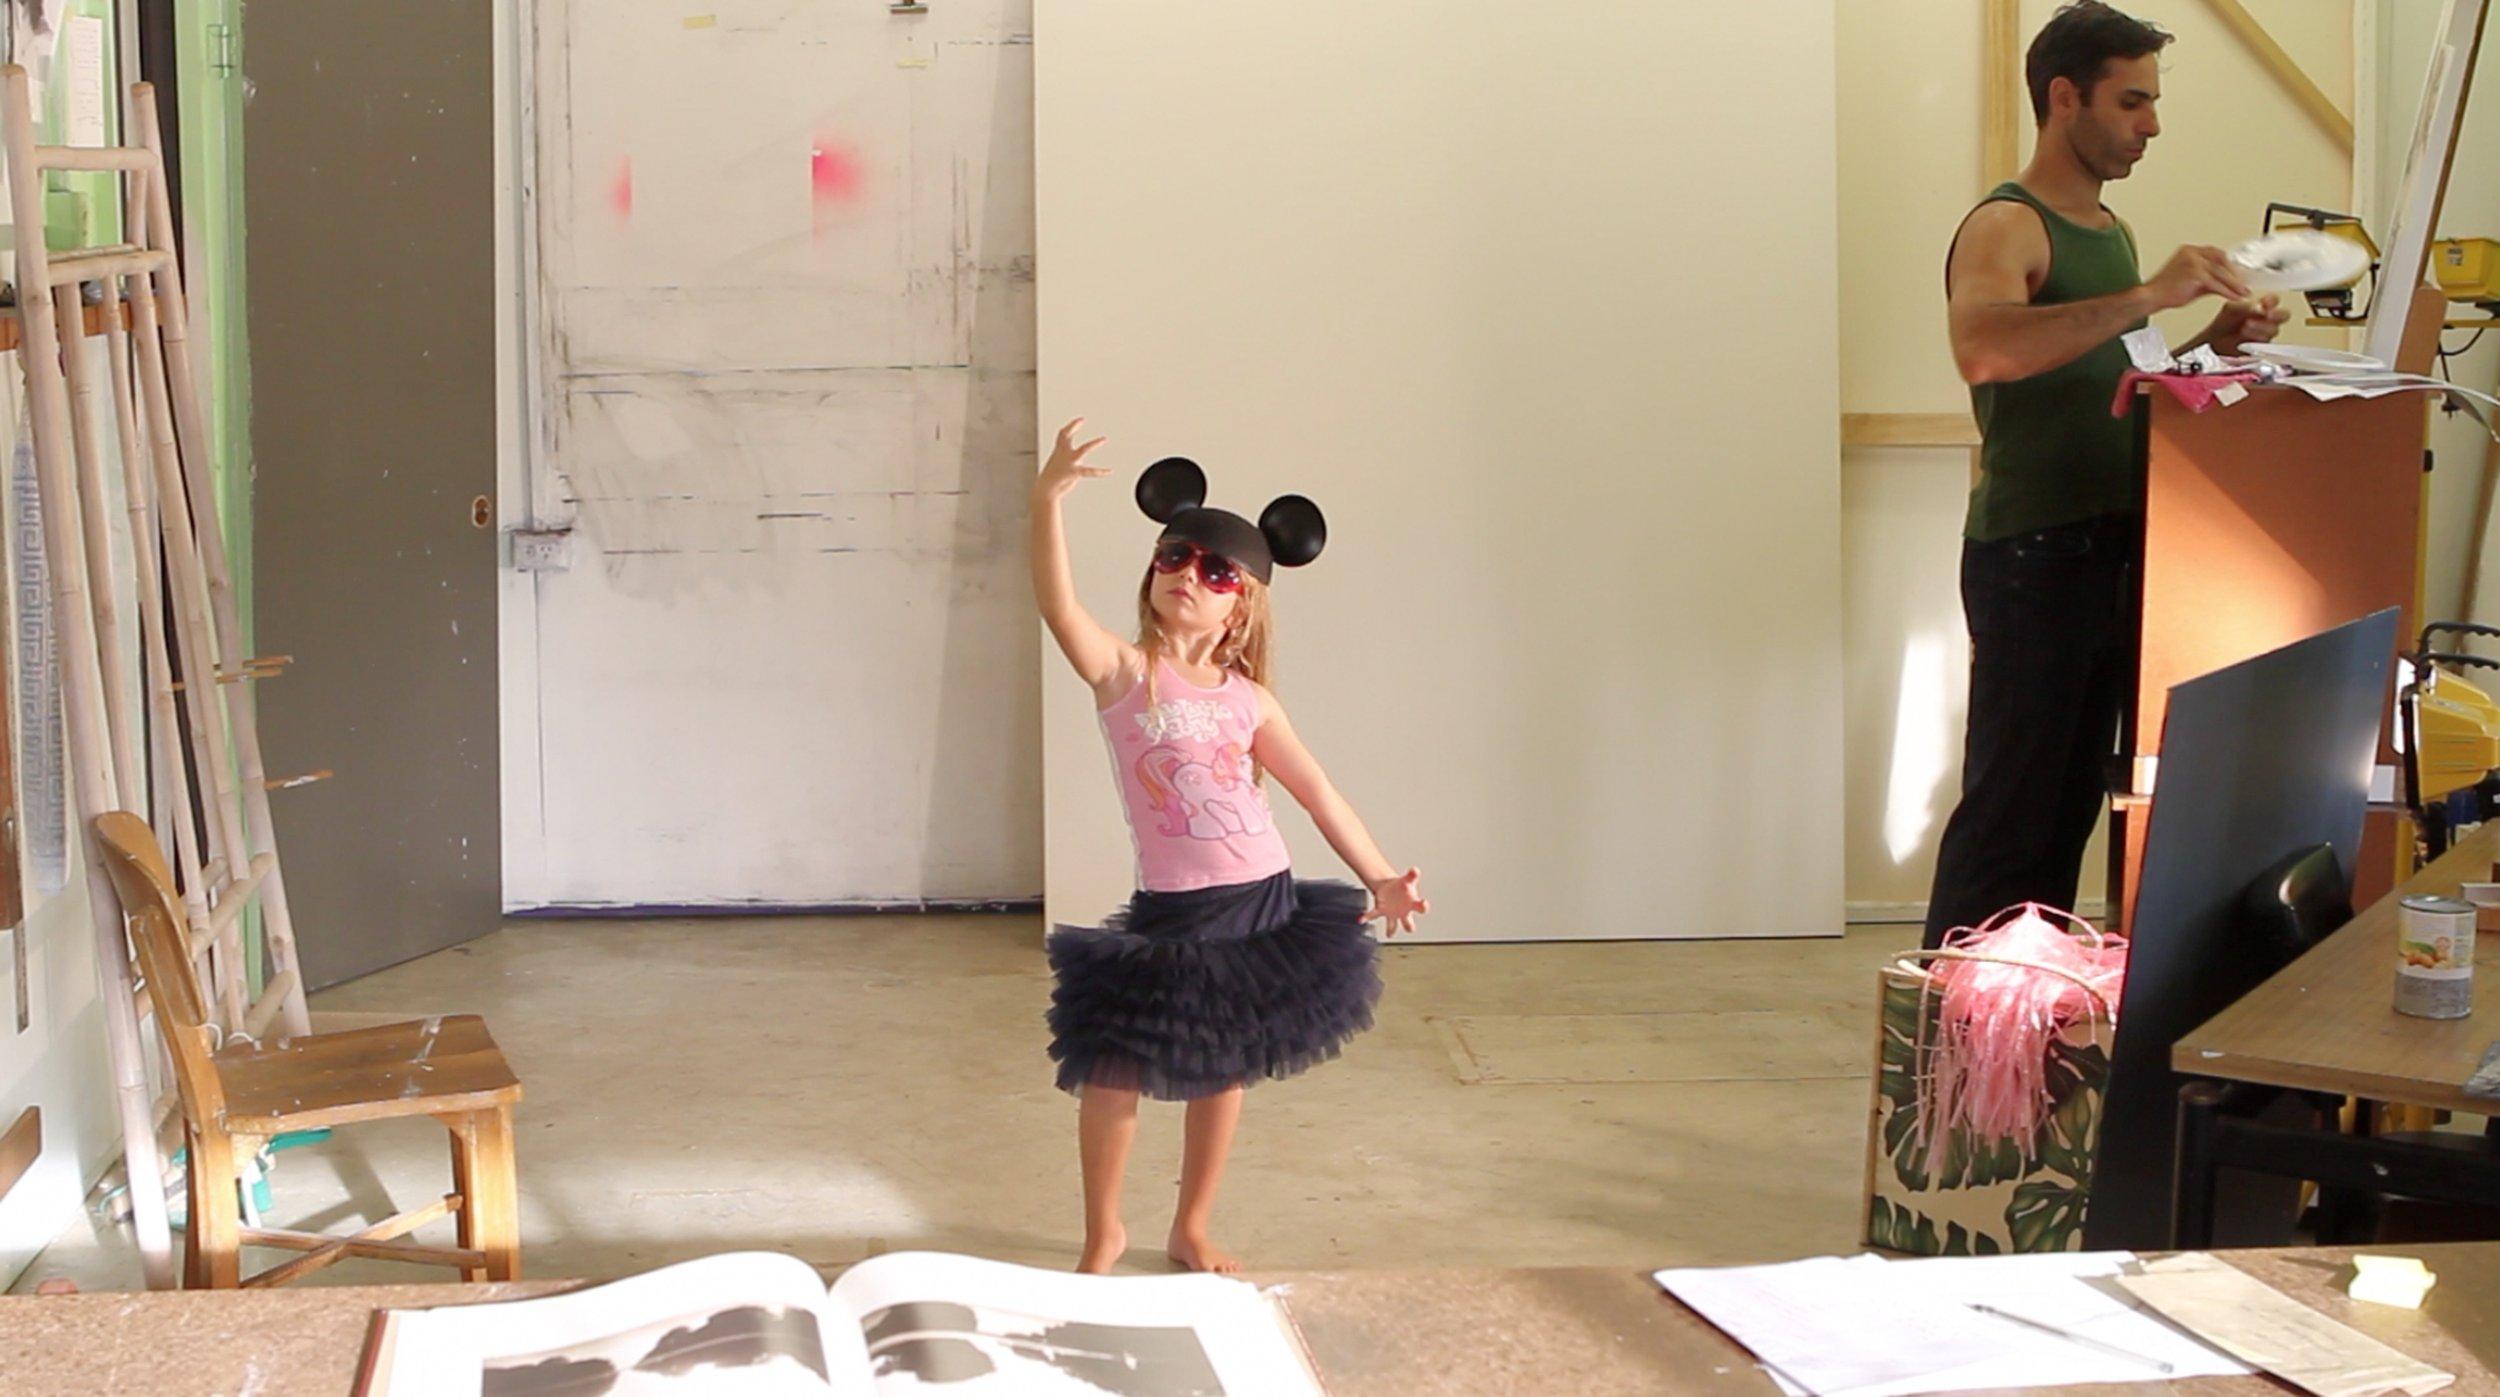 Michael Zavros,  We Dance In The Studio (To That Shit On The Radio) , 2010, digital video